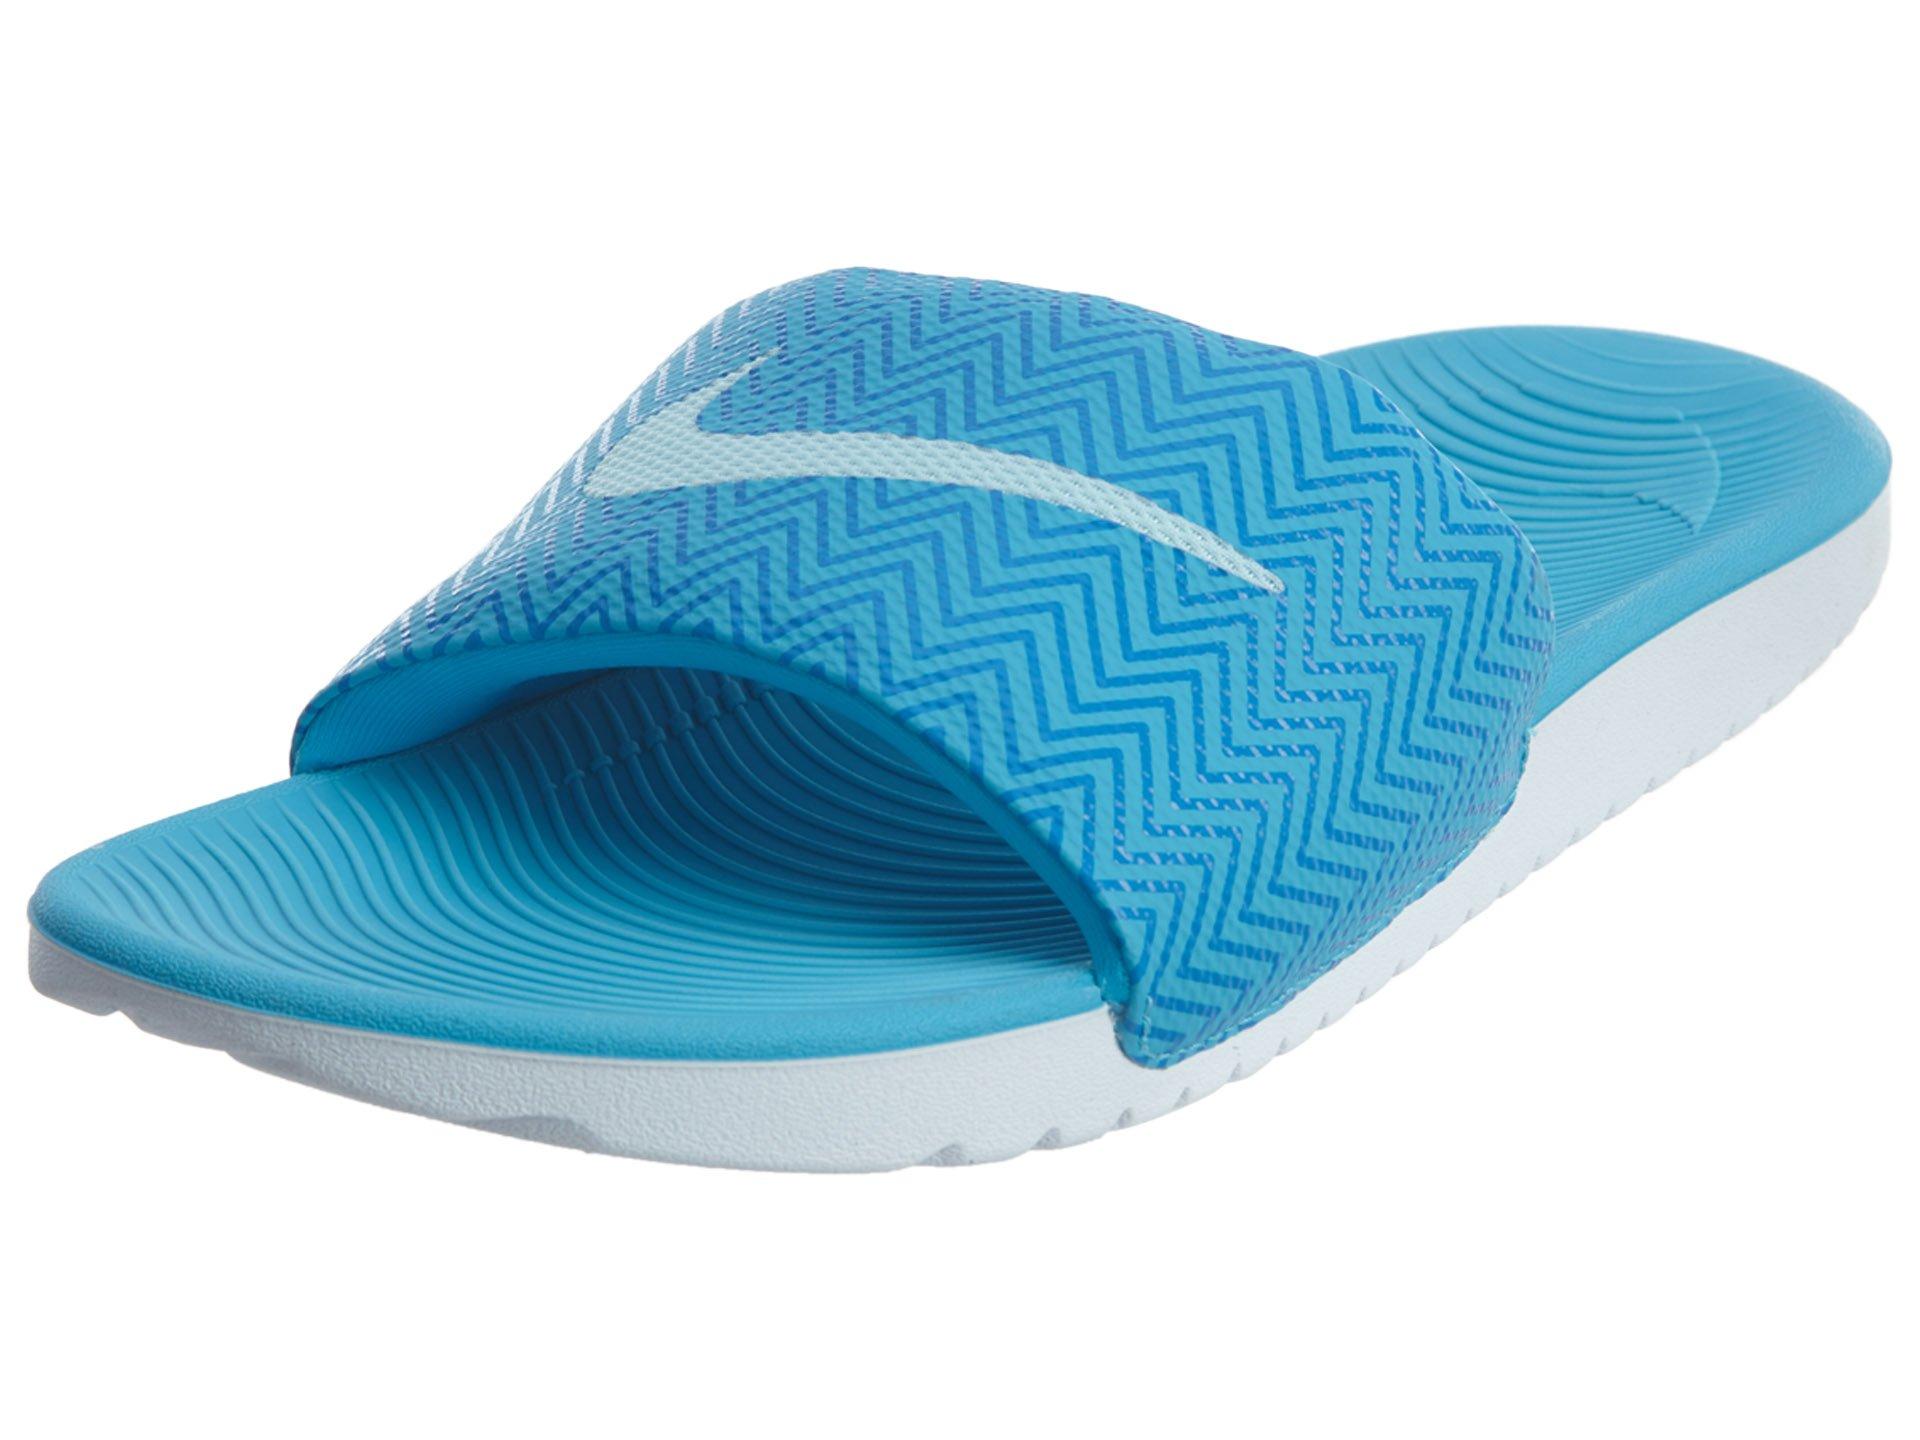 6f0982a4ec043 Galleon - Nike New Women s Kawa Slide Print Chlorine Blue Glacier 6